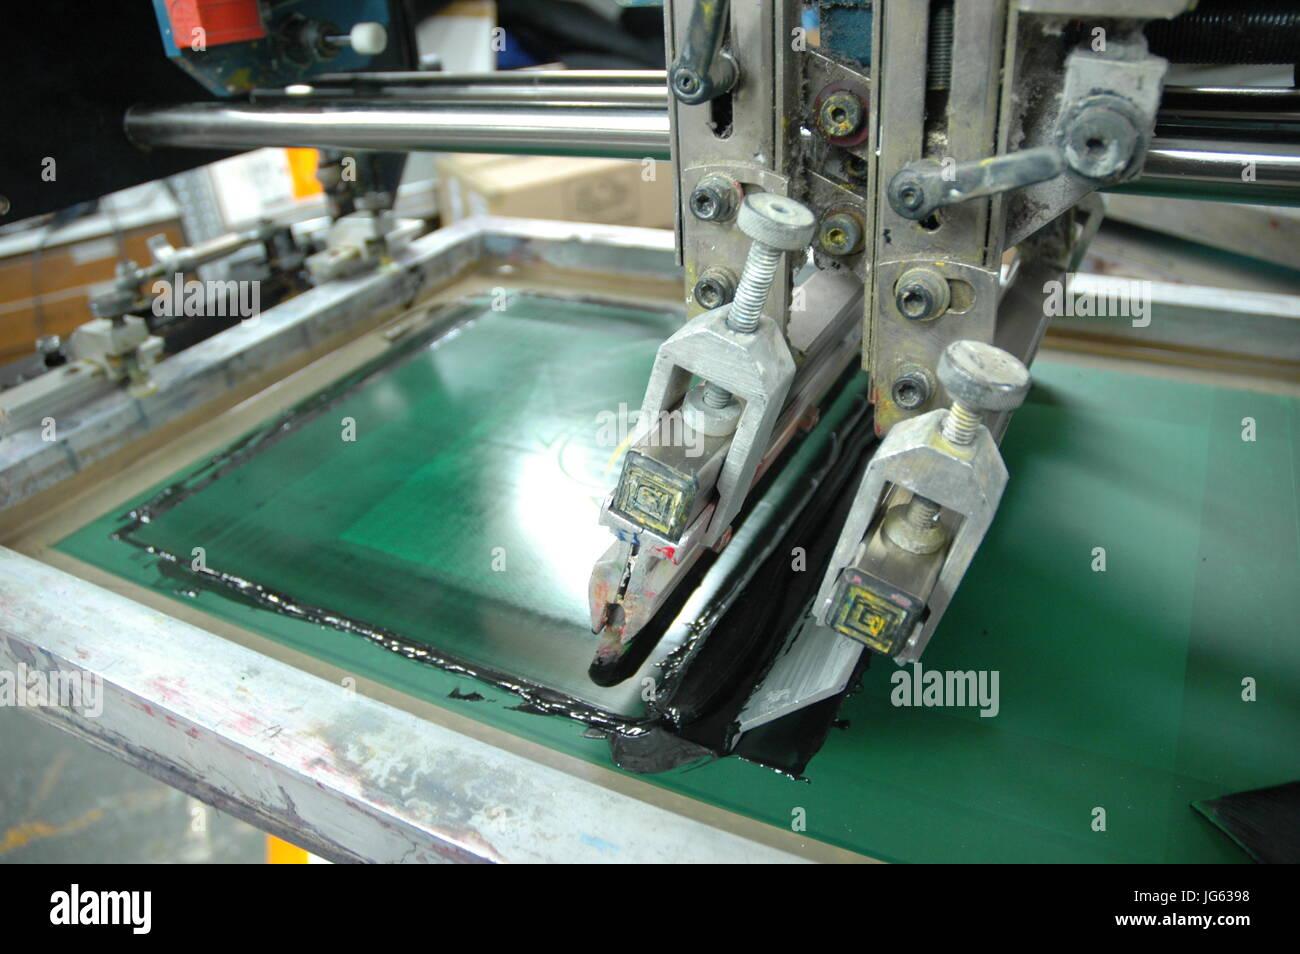 Automatic Industrial Screen Printing Machine Branding T Shirt